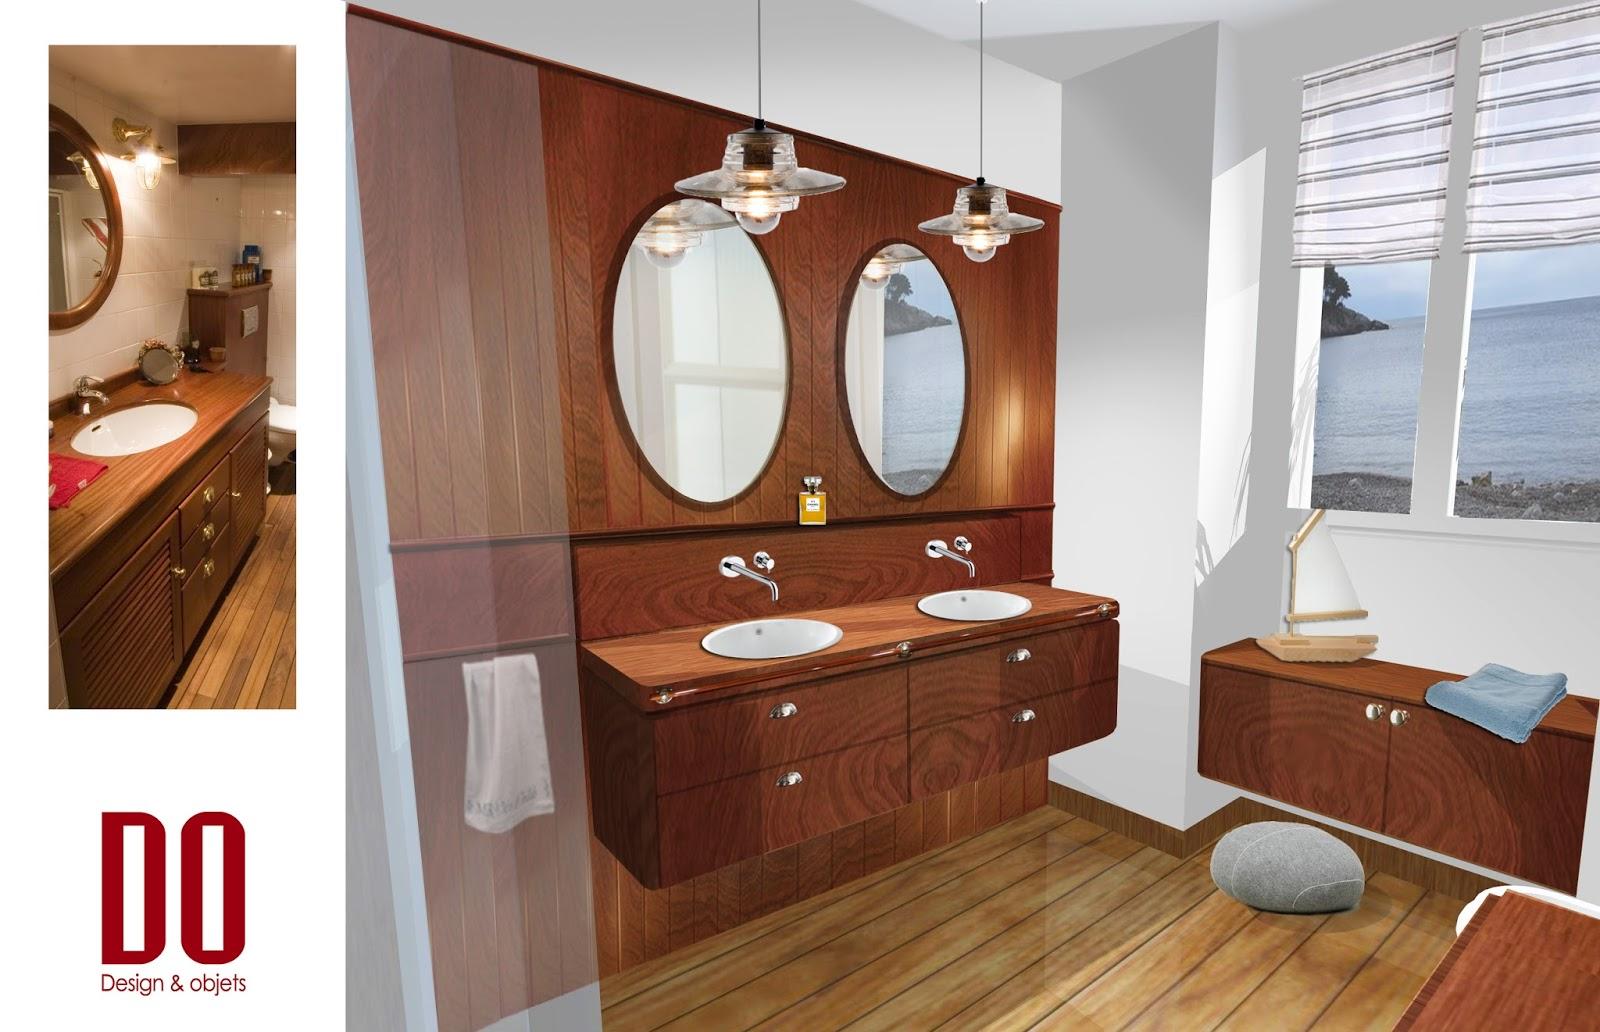 idfy architecture int rieur d coratrice graphiste biarritz bayonne agencement int rieur. Black Bedroom Furniture Sets. Home Design Ideas